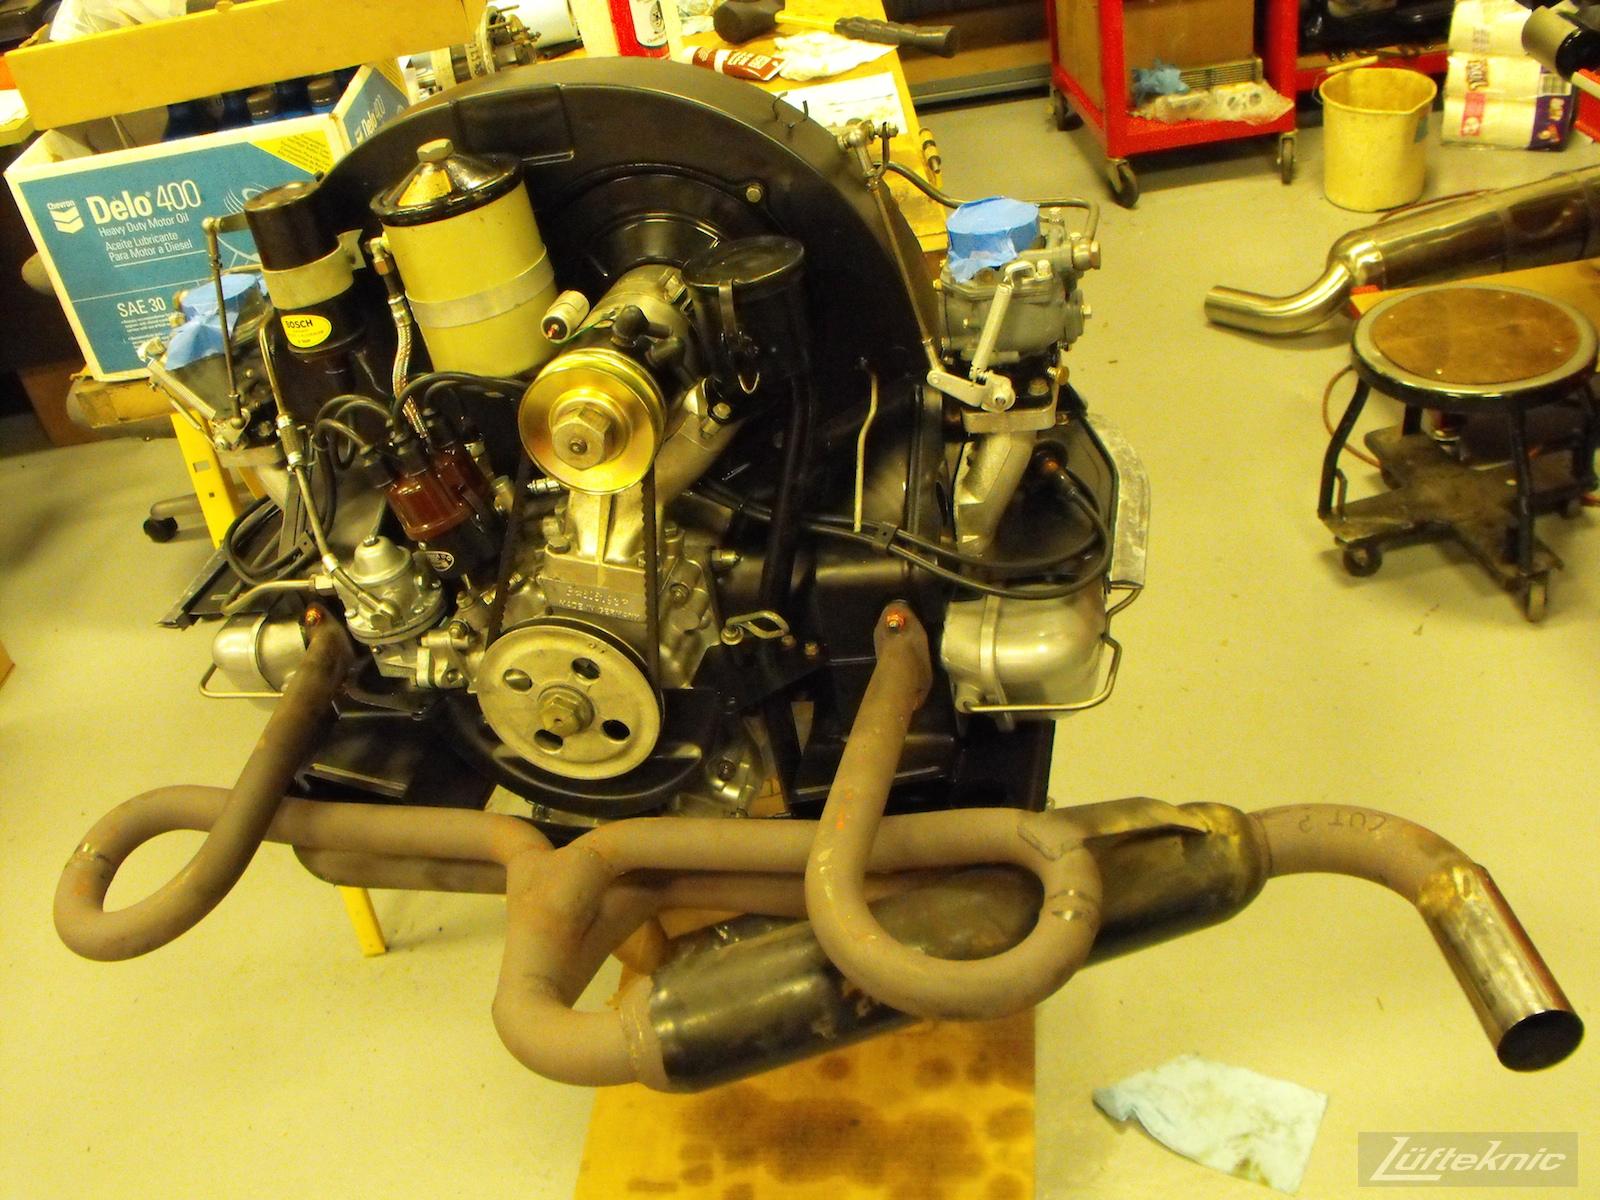 Engine with muffler for a 1961 Porsche 356B Roadster restoration.